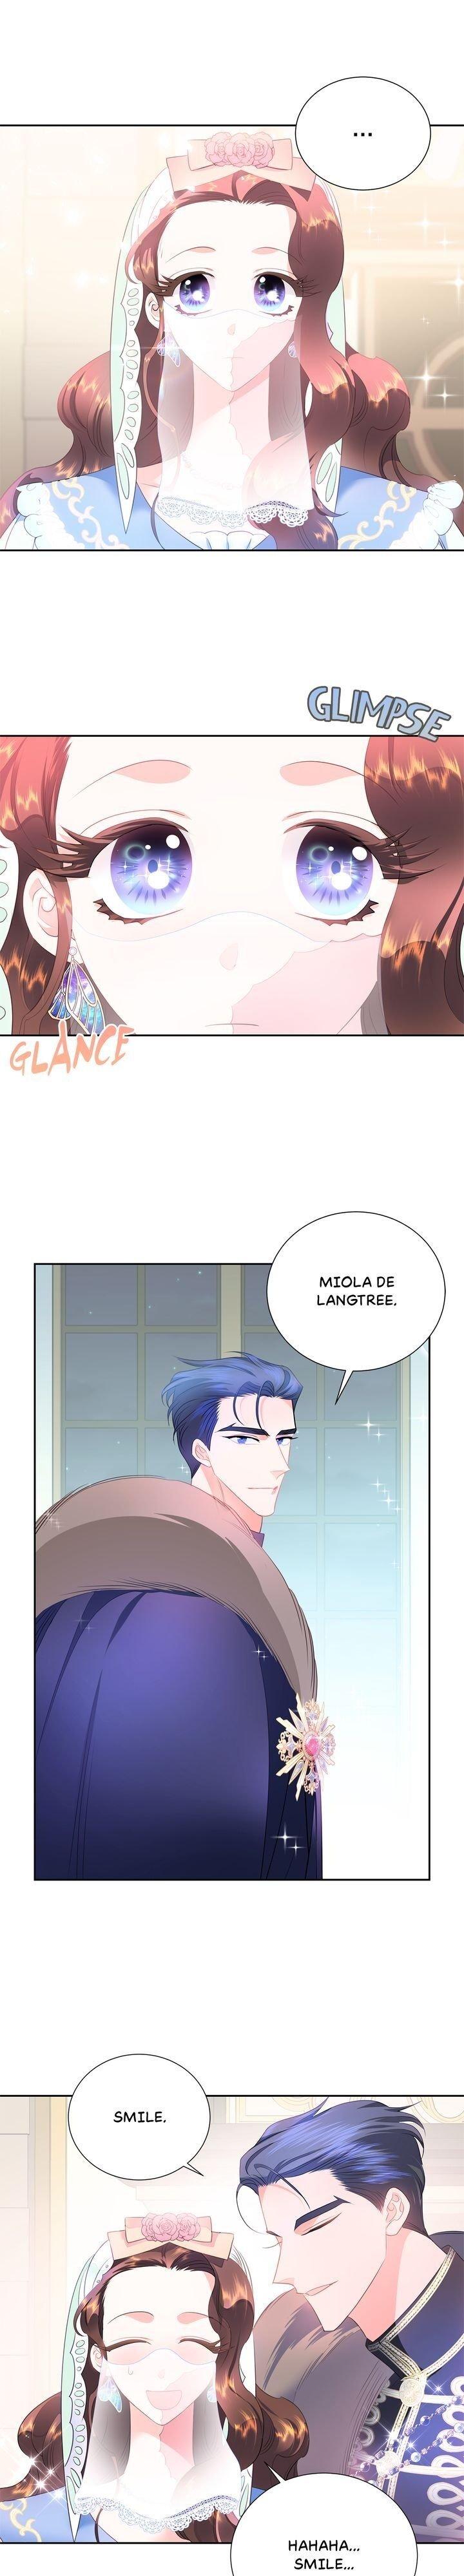 Manga The Princess' Spaceship - Chapter 68 Page 1